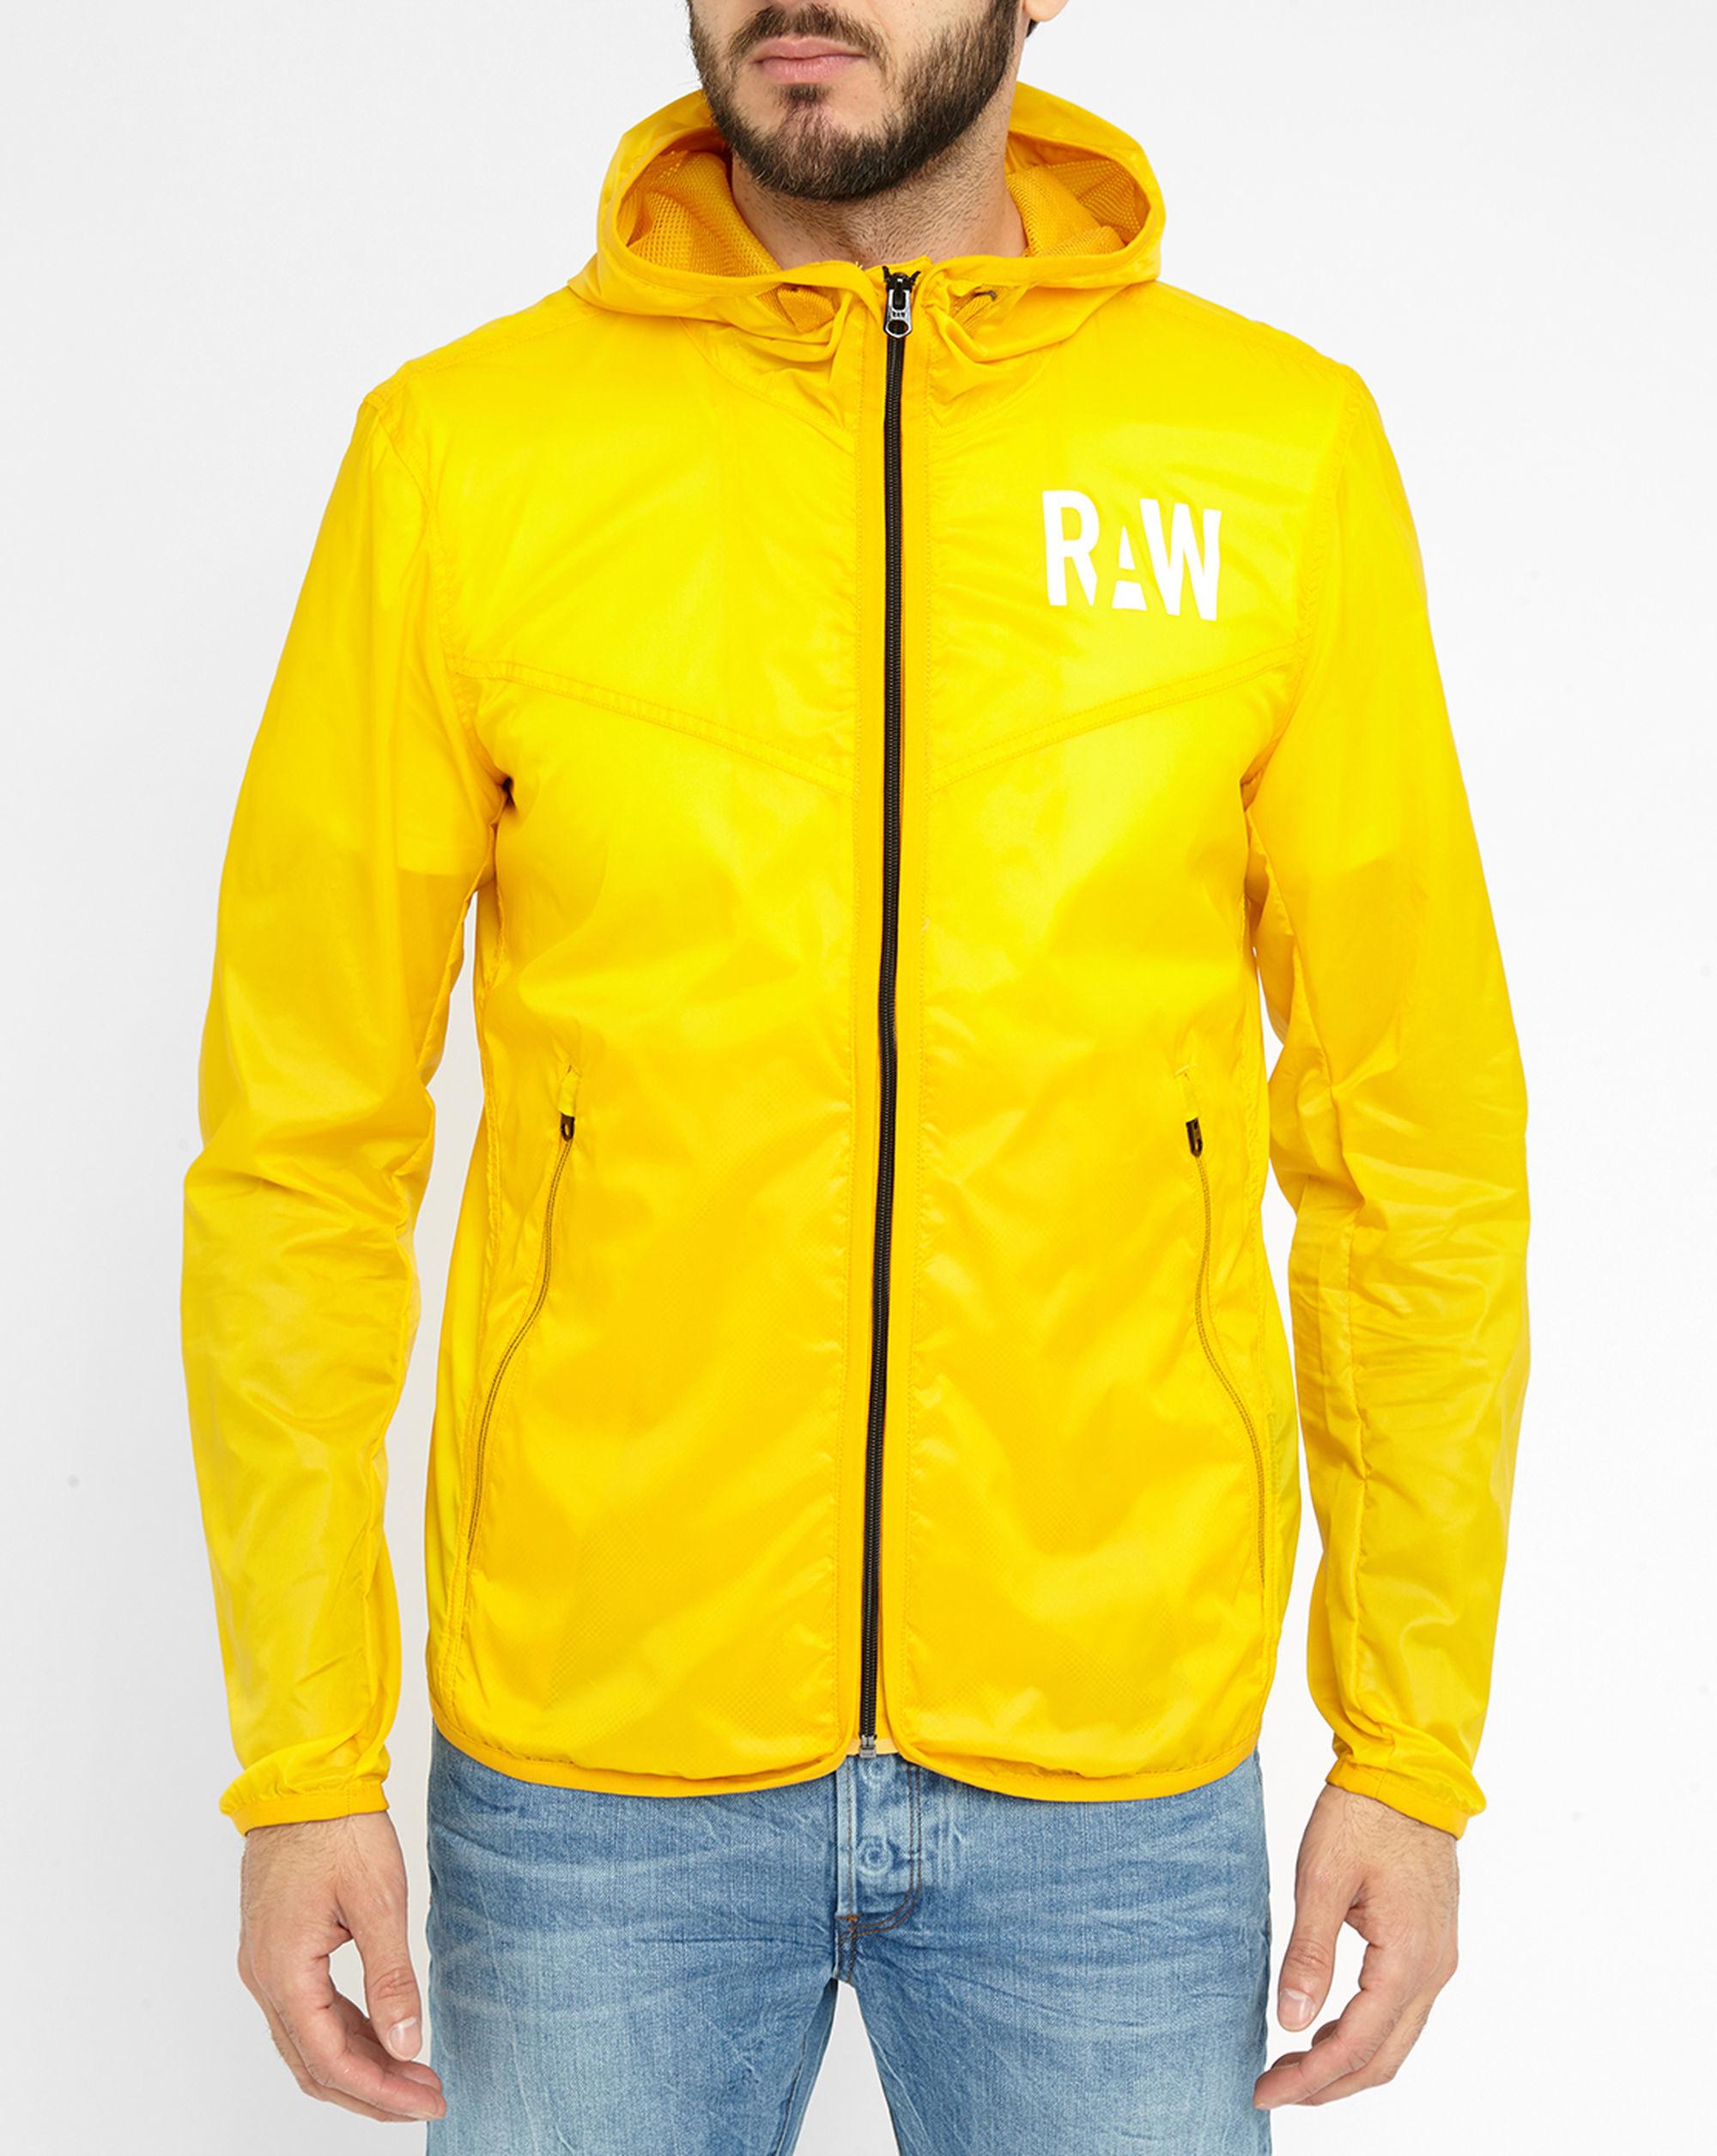 g star raw yellow packable waterproof jacket in. Black Bedroom Furniture Sets. Home Design Ideas